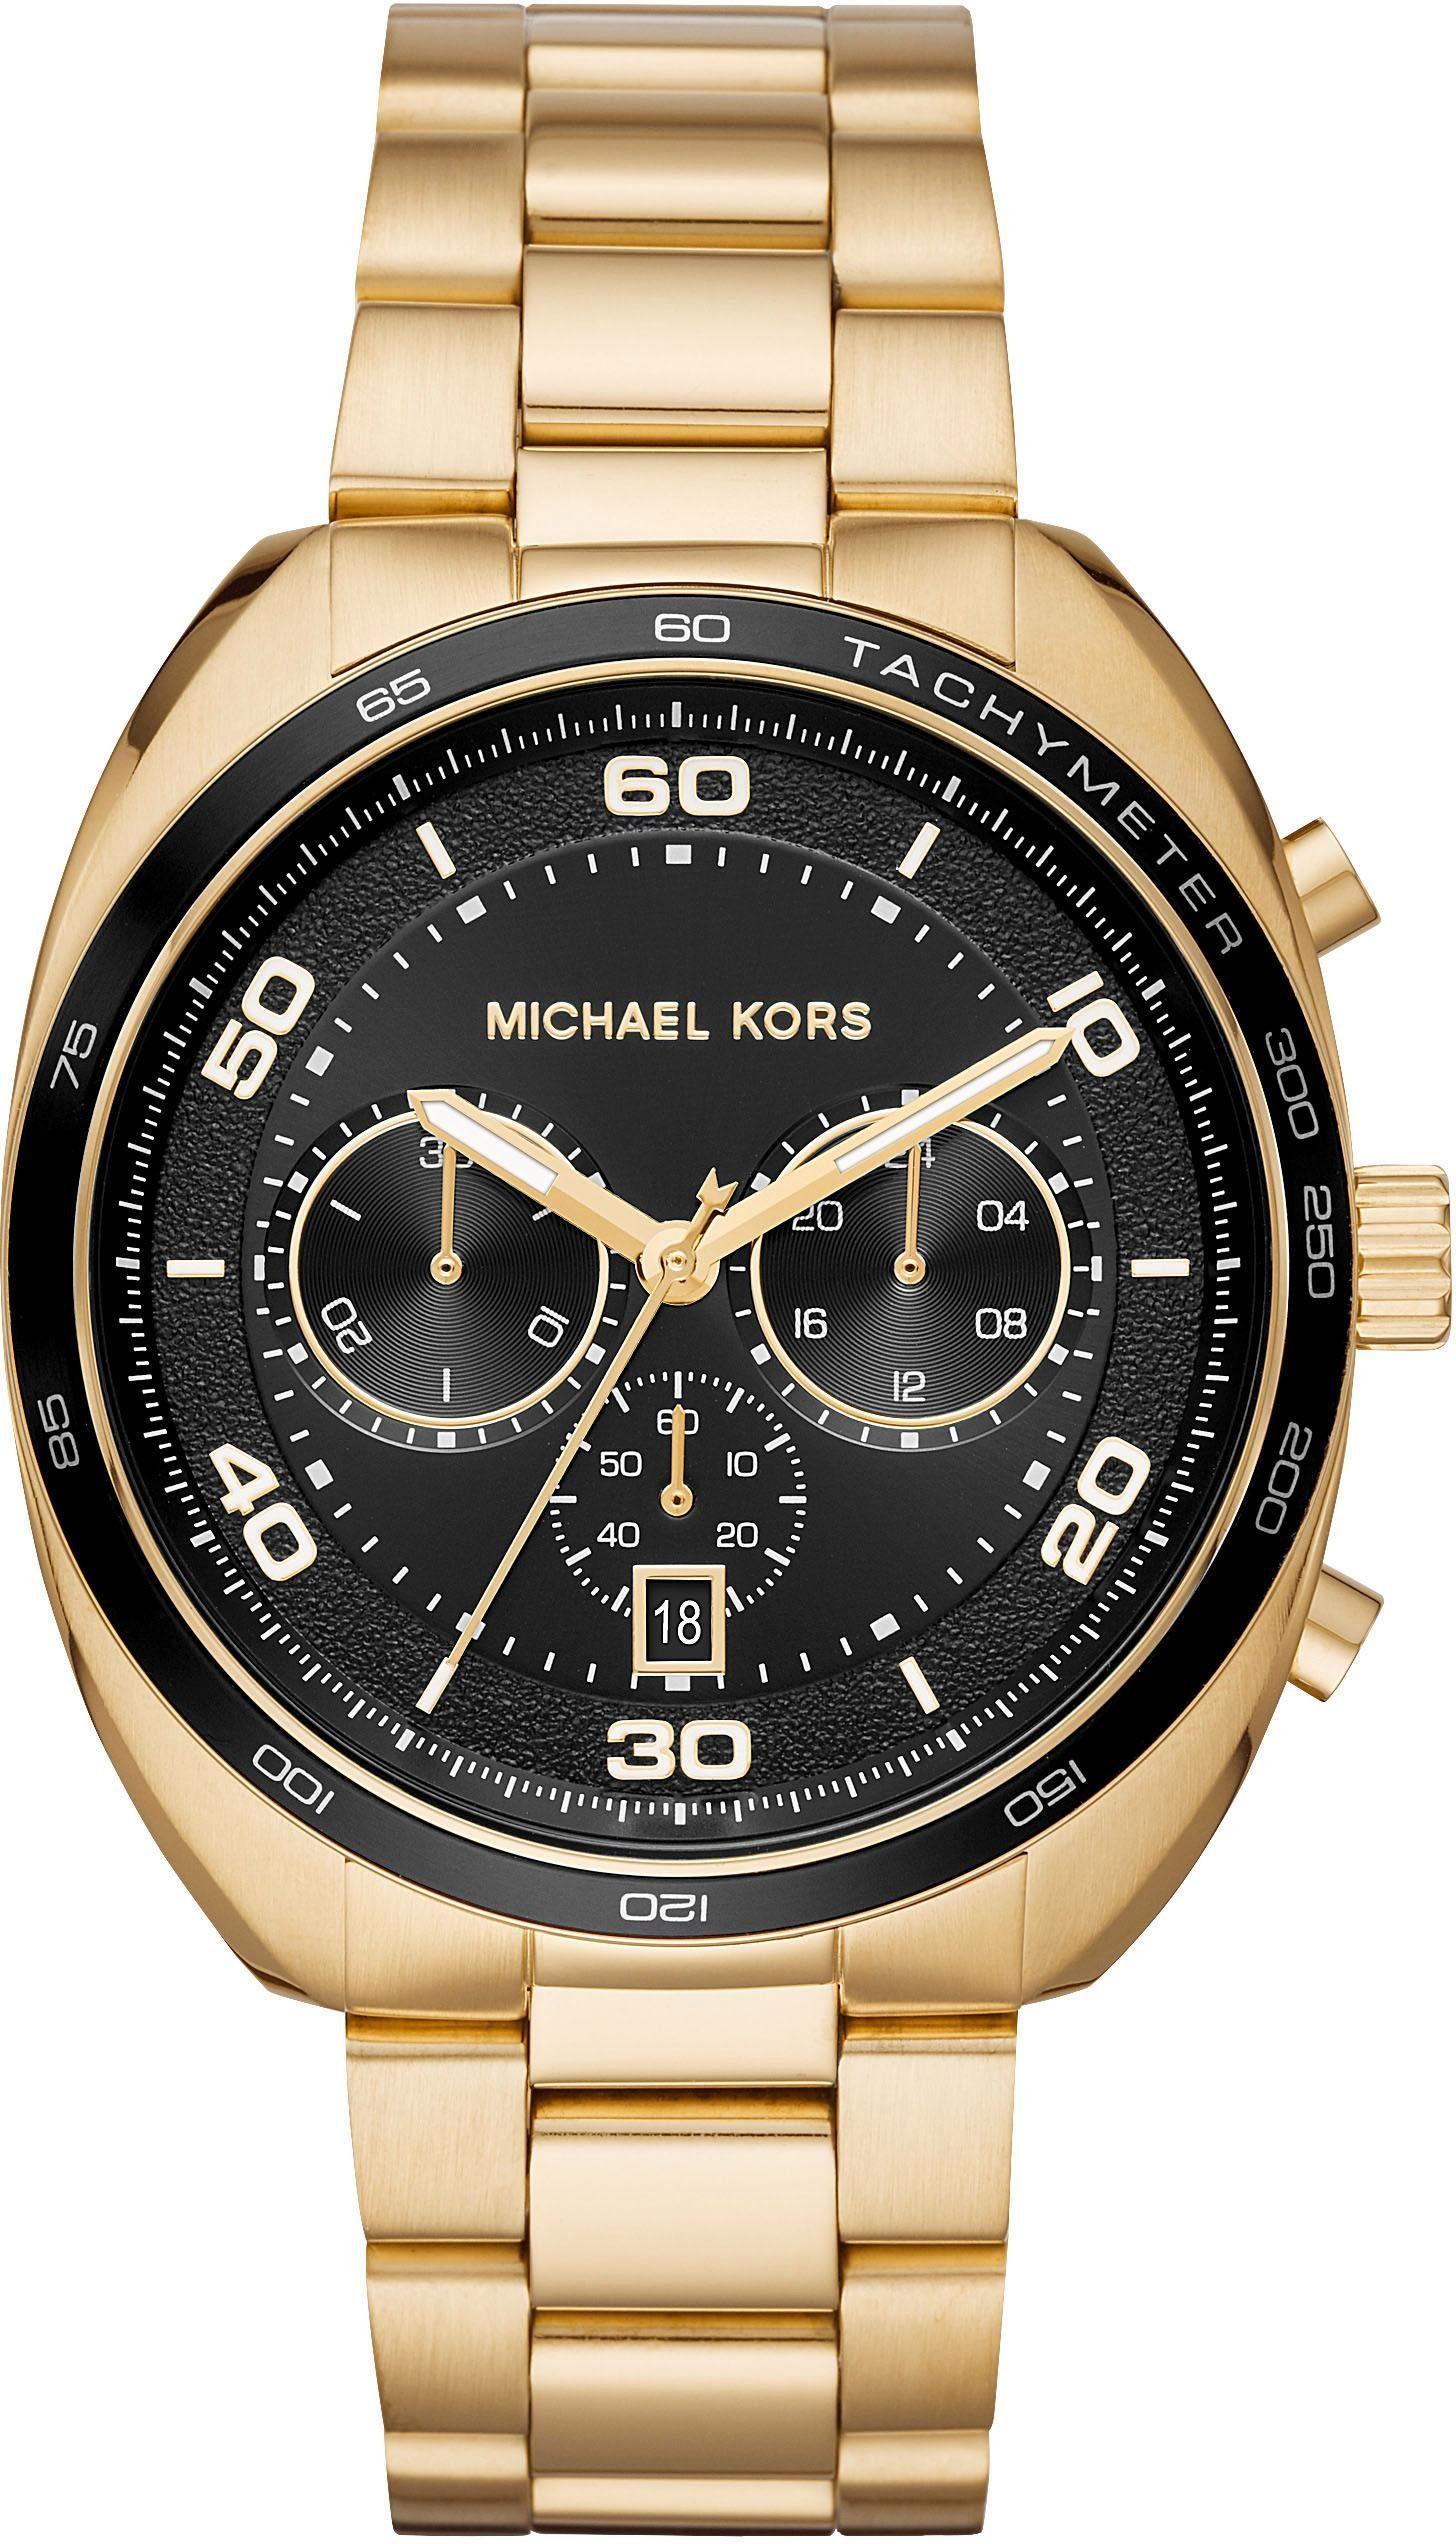 MICHAEL KORS Chronograph »DANE, MK8614«